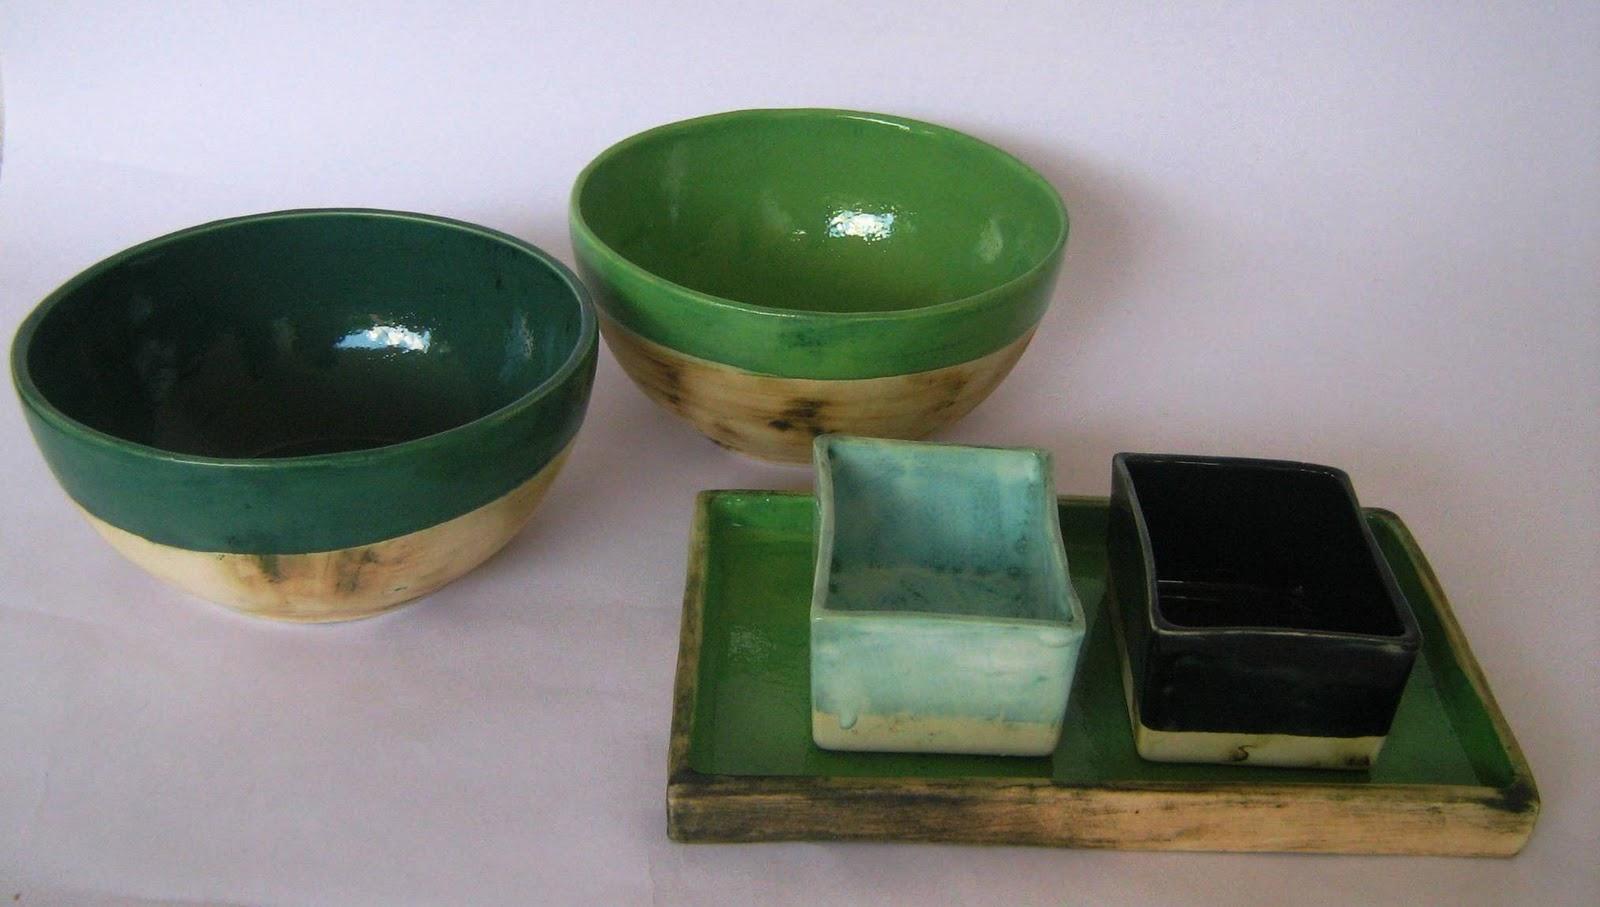 Hakuna matata ceramica artesanal cuencos y distintas for Materiales para ceramica artesanal